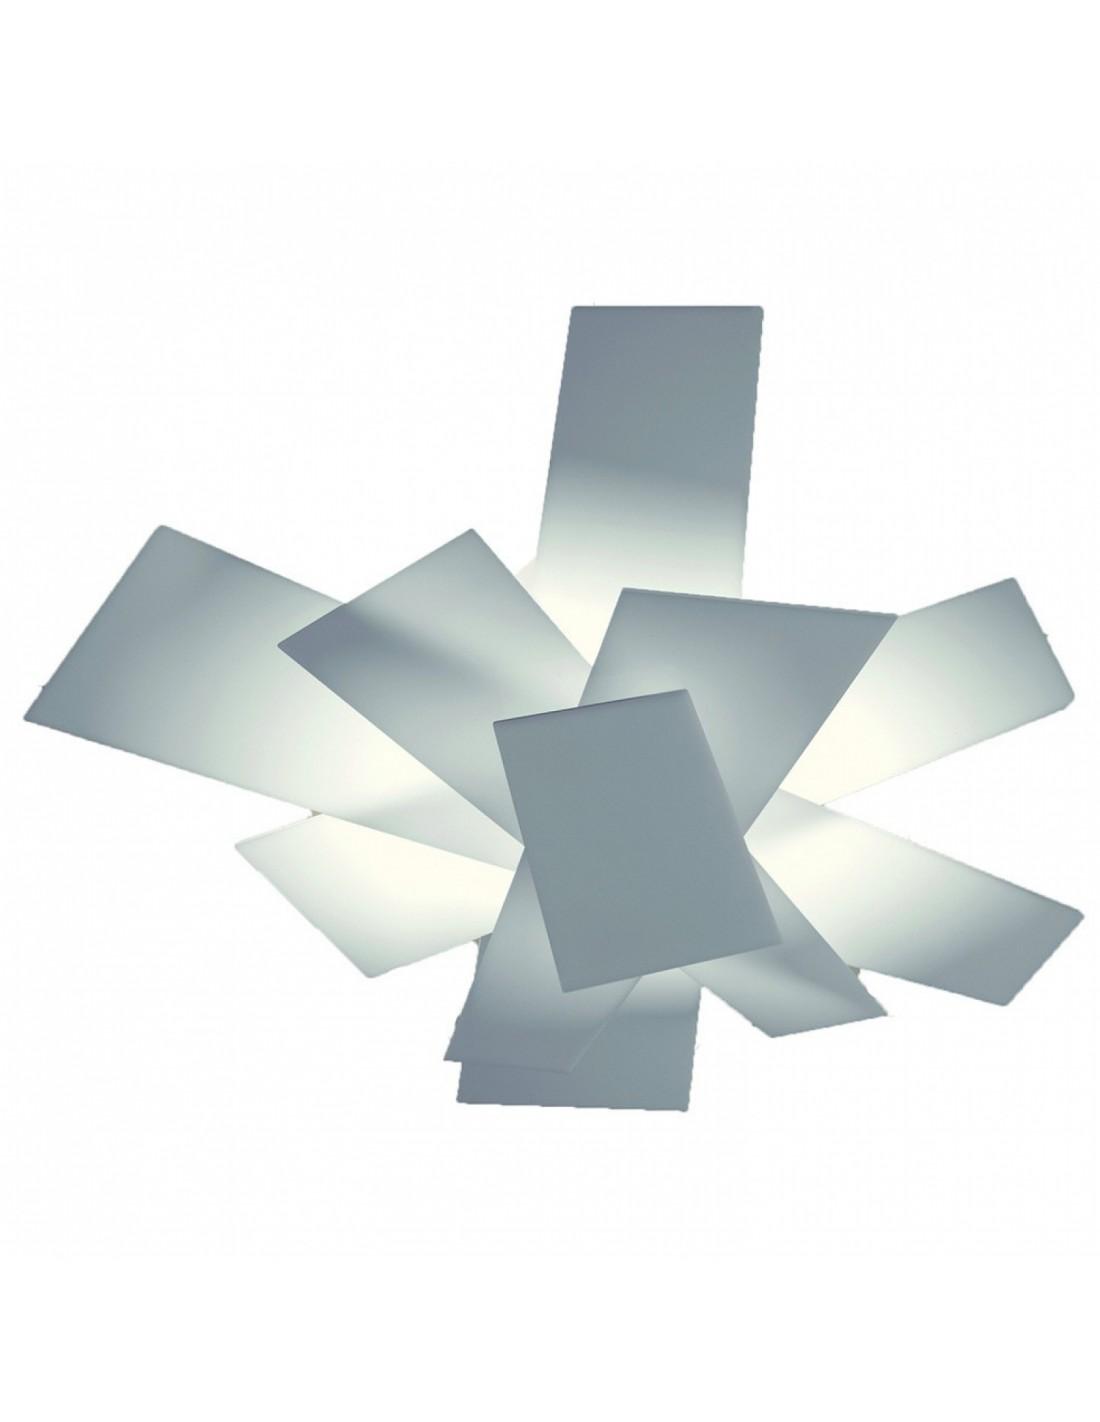 Valente-design-luminaires-Applique-foscarini-Big-Bang-Blanc